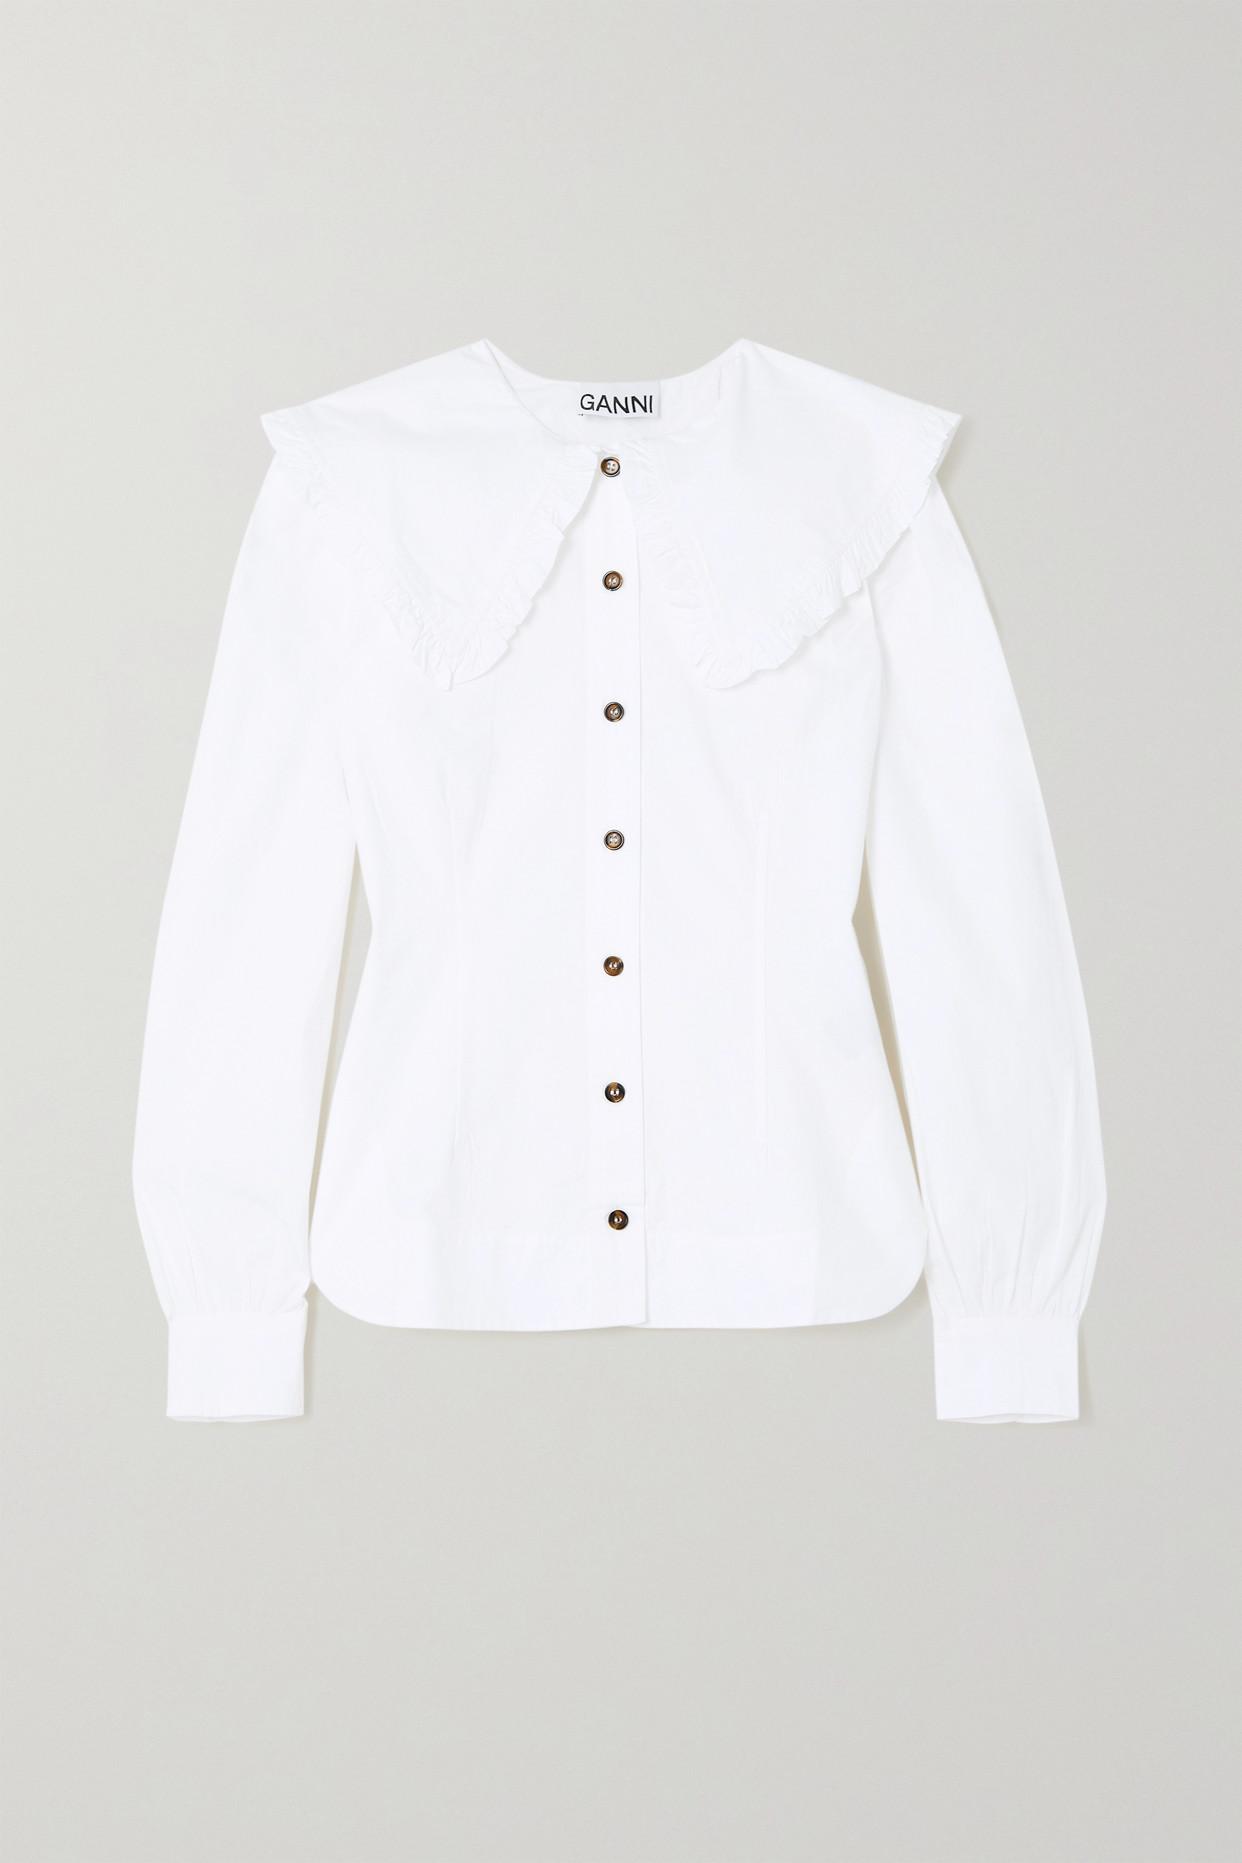 GANNI - + Net Sustain Ruffled Organic Cotton-poplin Blouse - White - DK32